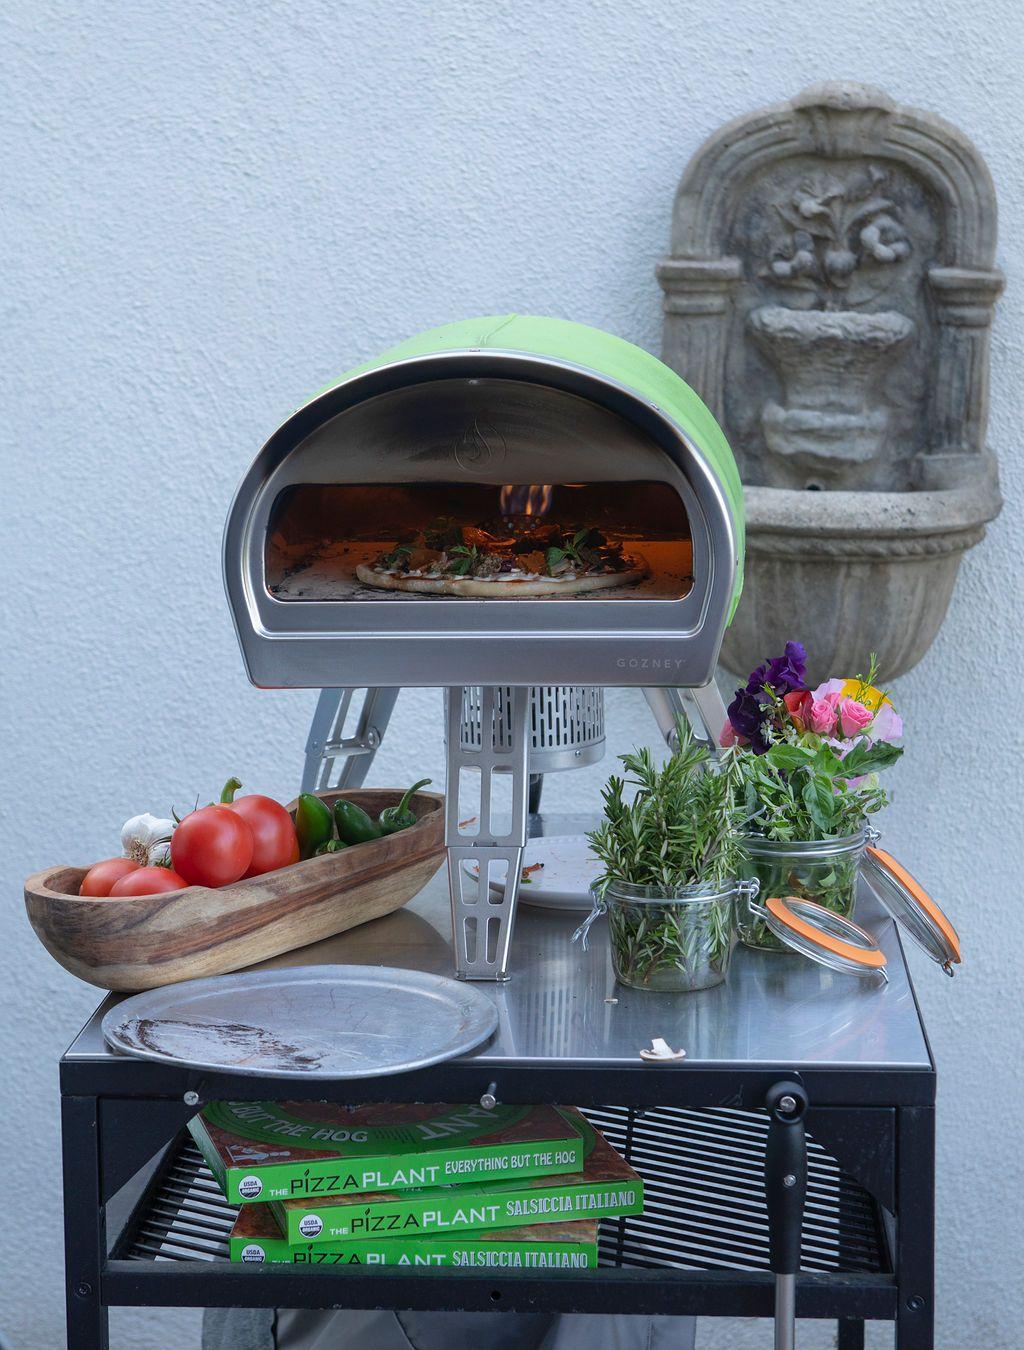 5 Crazy Delicious Ways to Cook Pizza